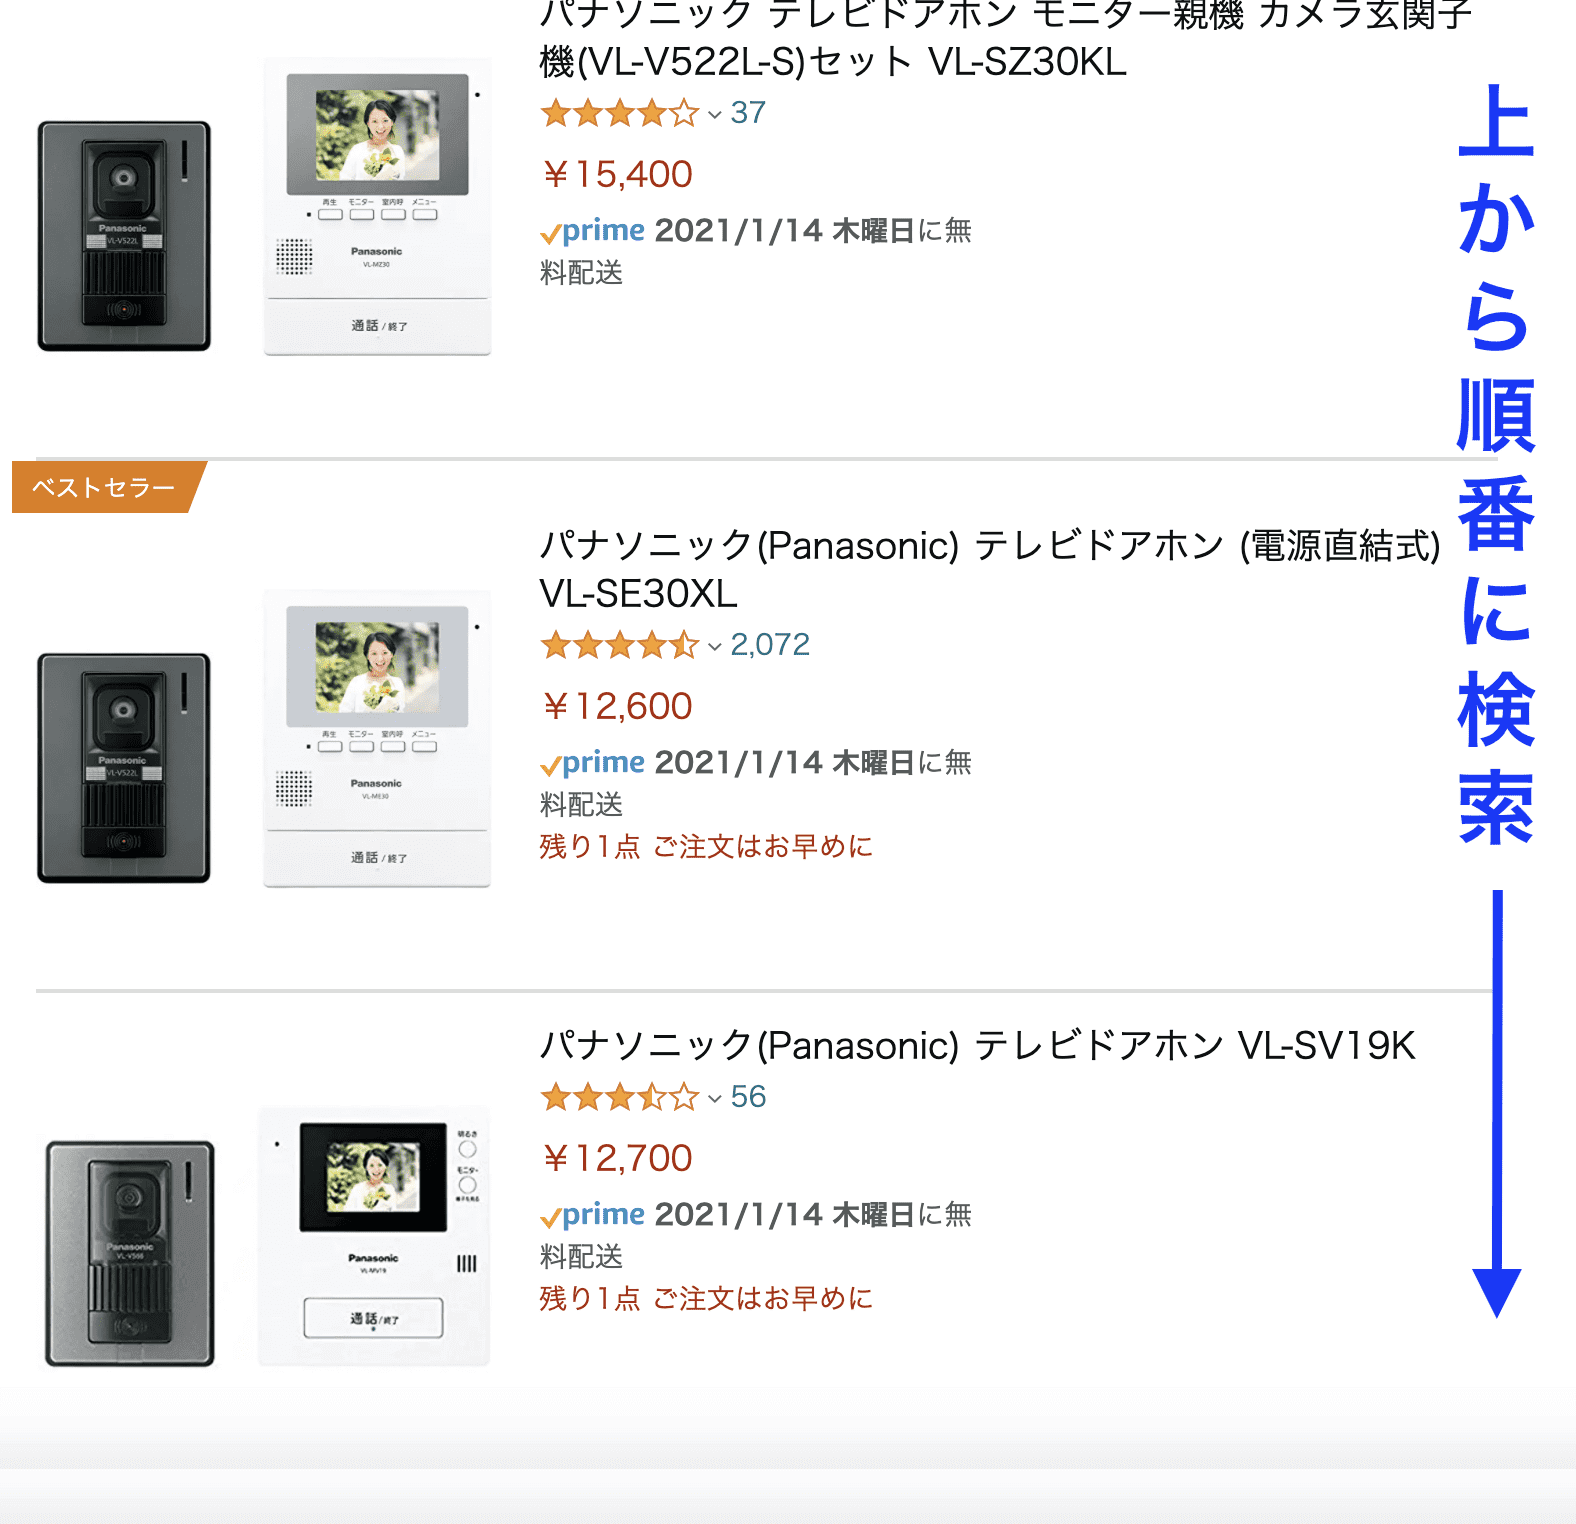 Amazonライバルセラーのリサーチ方法